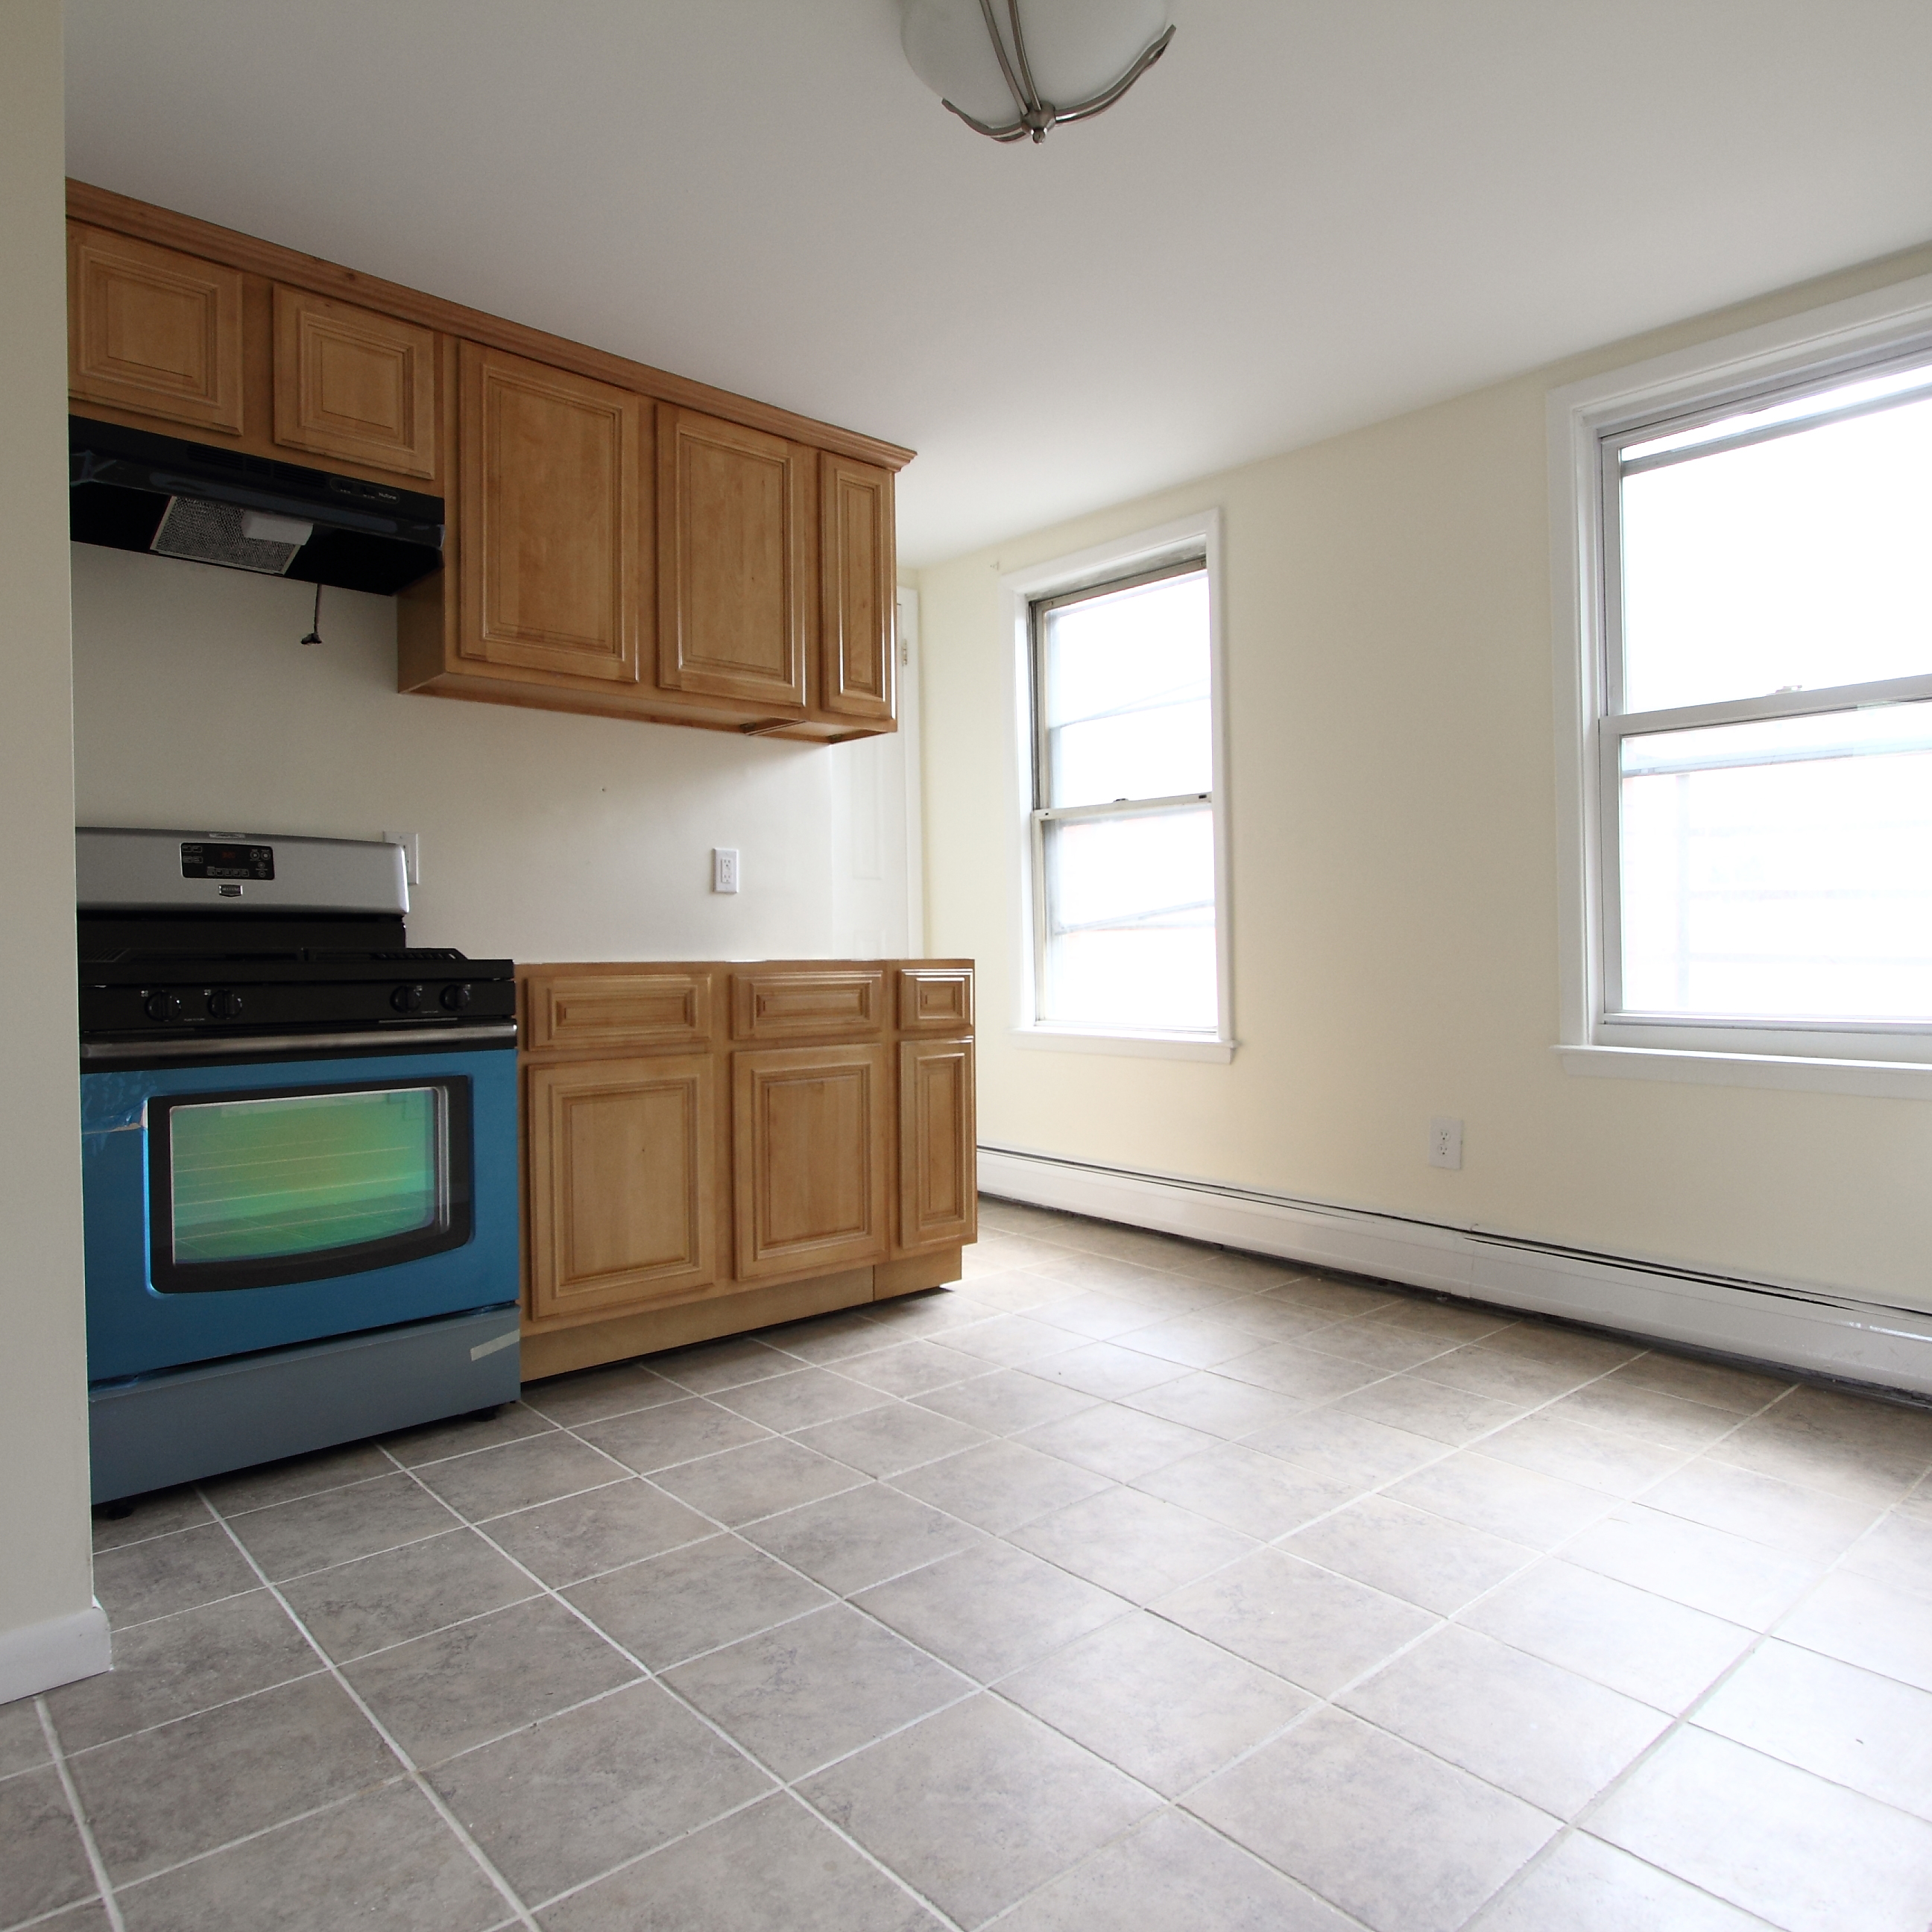 Image of property 330 2nd St, U3